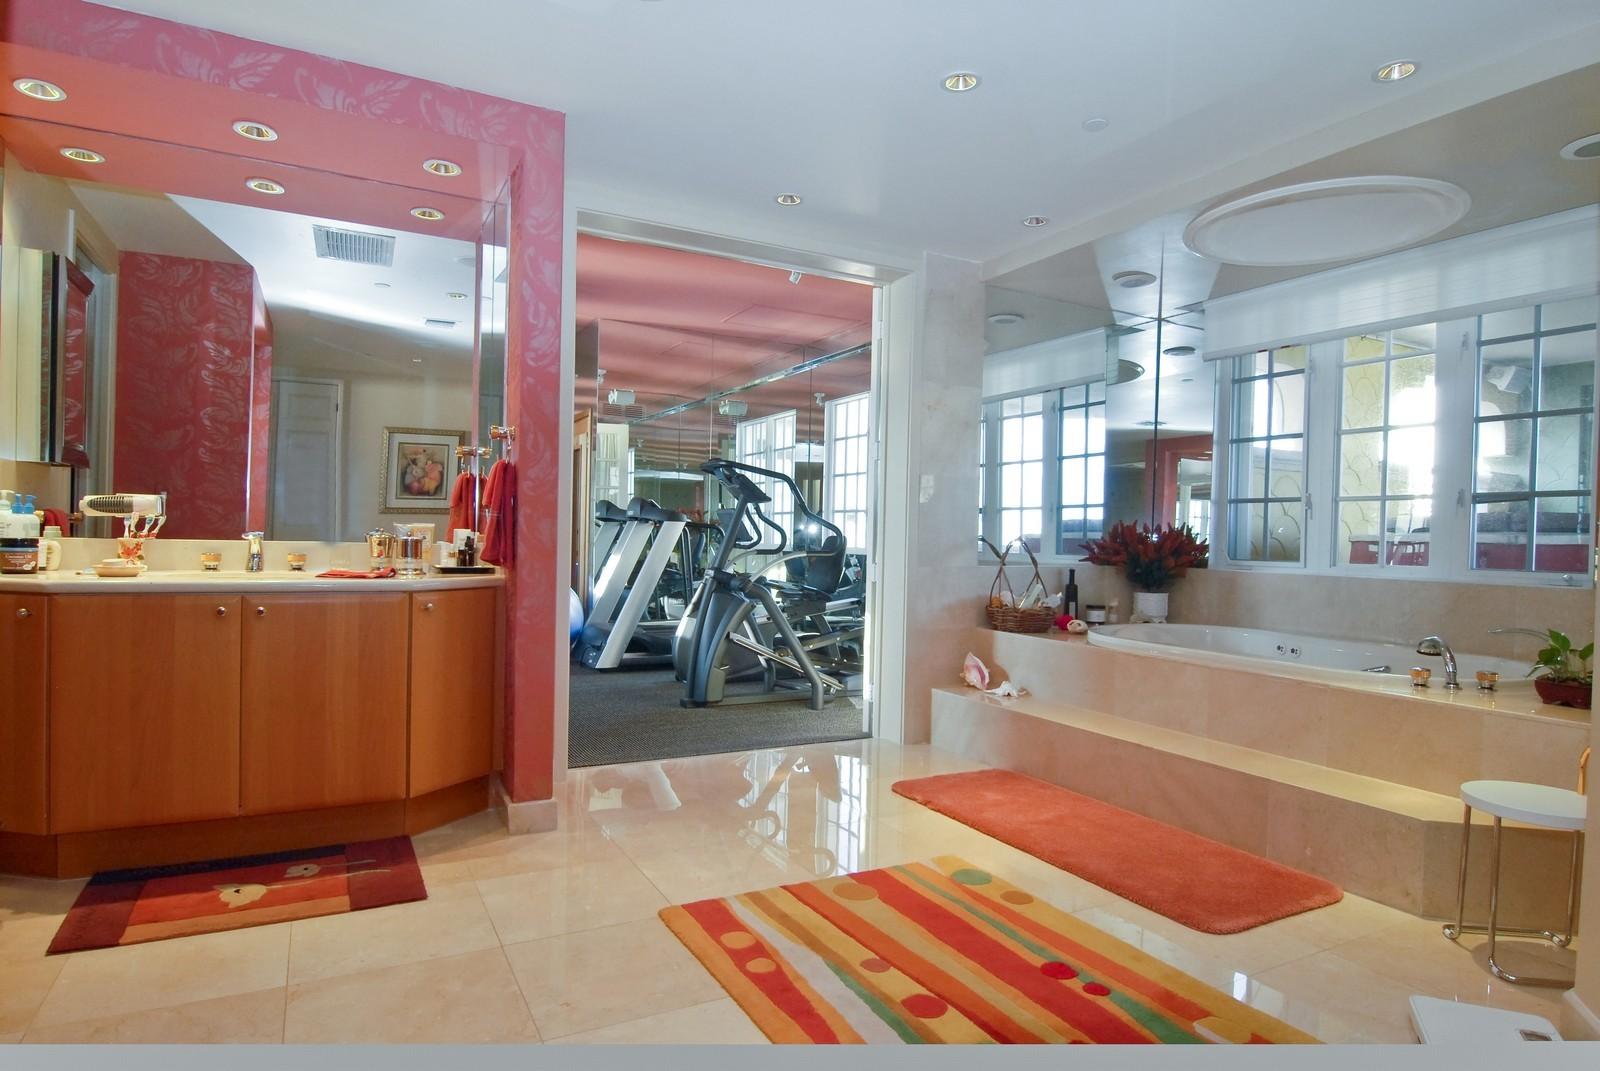 Real Estate Photography - 5294 Fisher Island Dr, Fisher Island, FL, 33109 - Master Bathroom